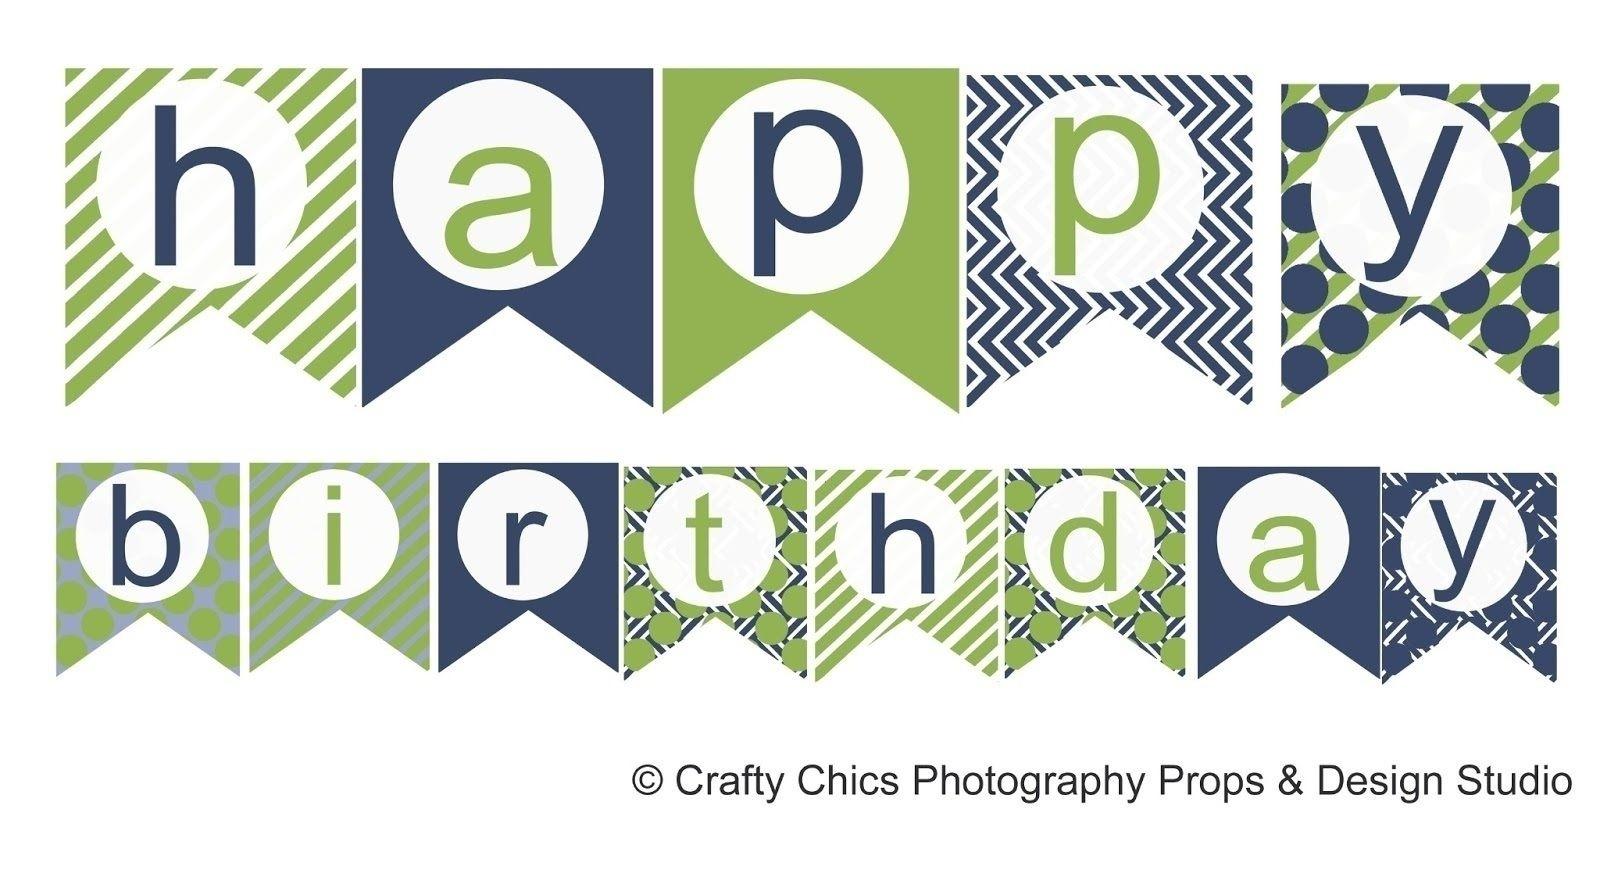 Free Printable Happy Birthday Banner Templates | Bestprintable231118 - Free Printable Happy Birthday Banner